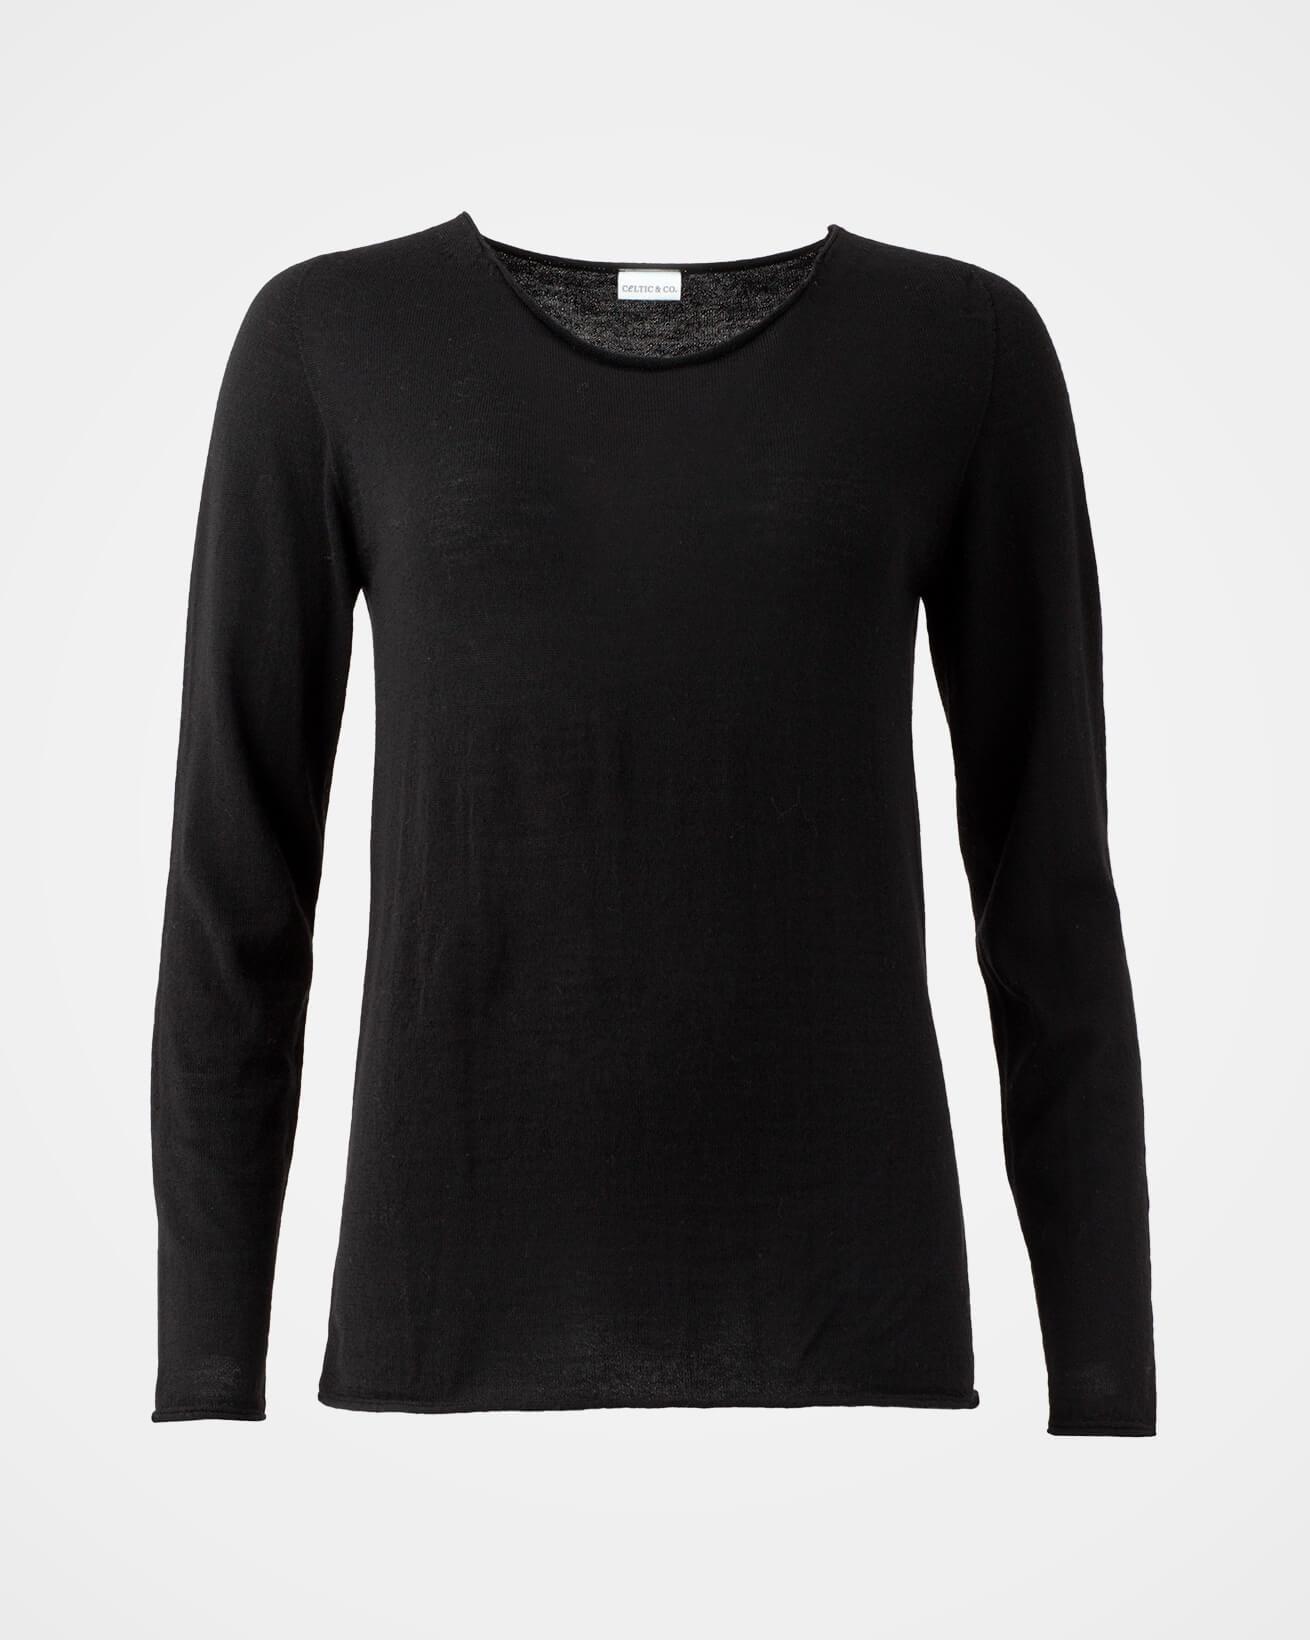 7036_fine-knit-merino-crew-neck_black_front_web.jpg